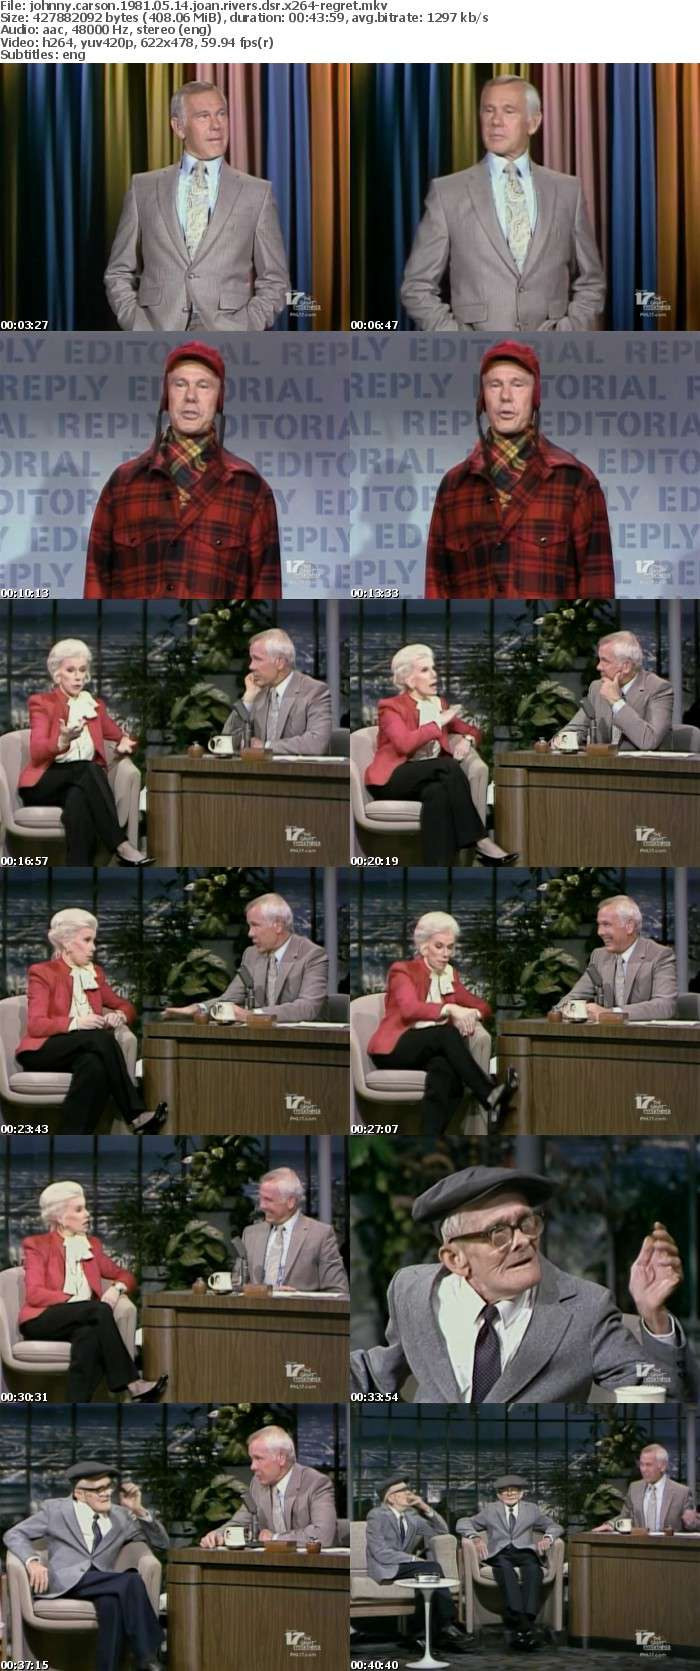 Johnny Carson 1981 05 14 Joan Rivers DSR x264-REGRET